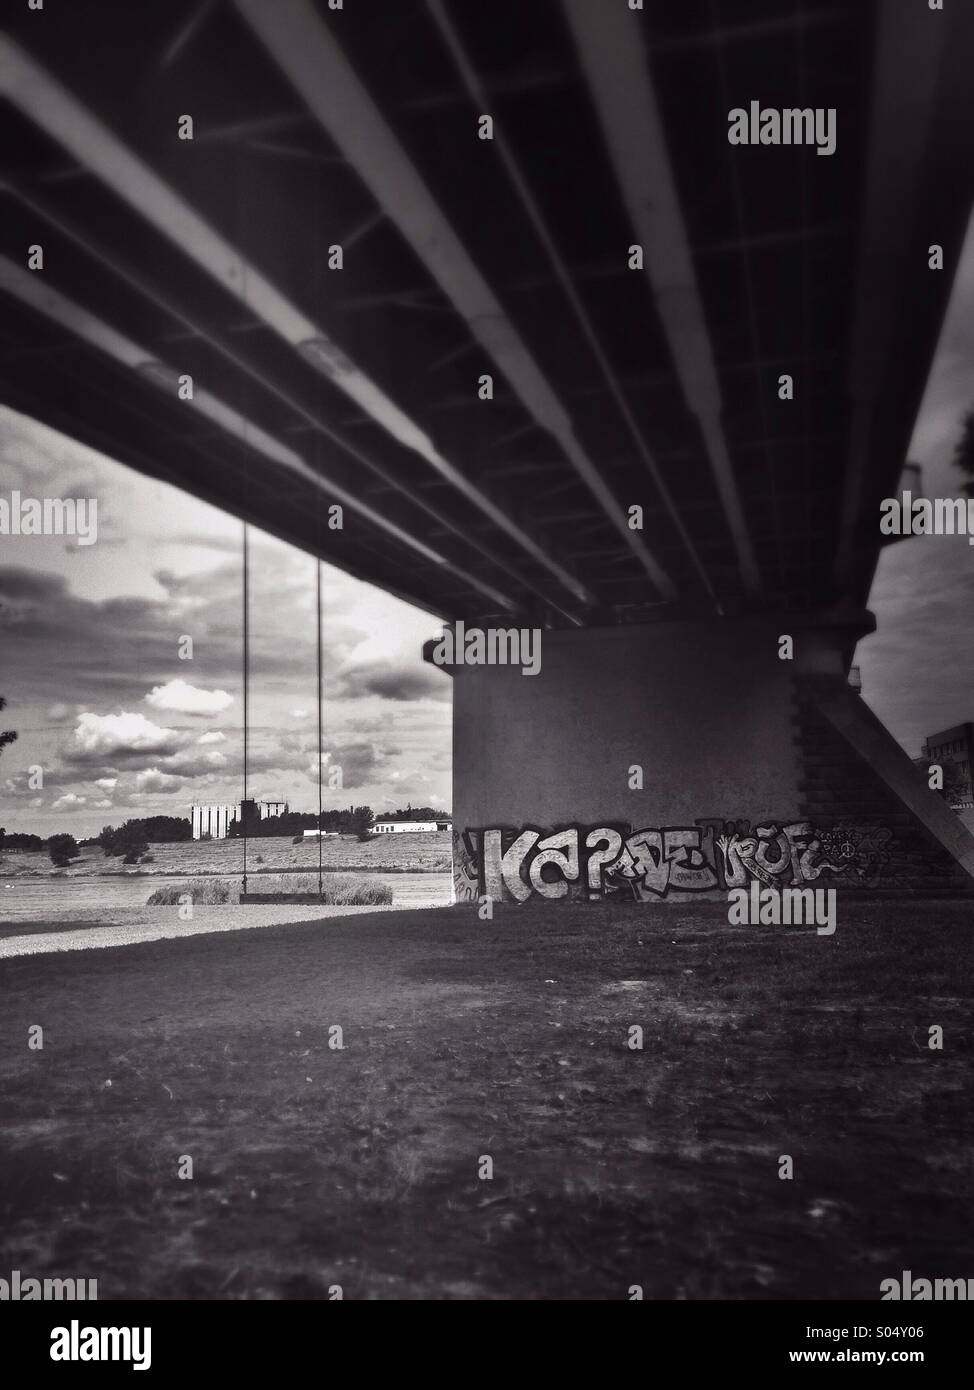 Swinging under the bridge - Stock Image